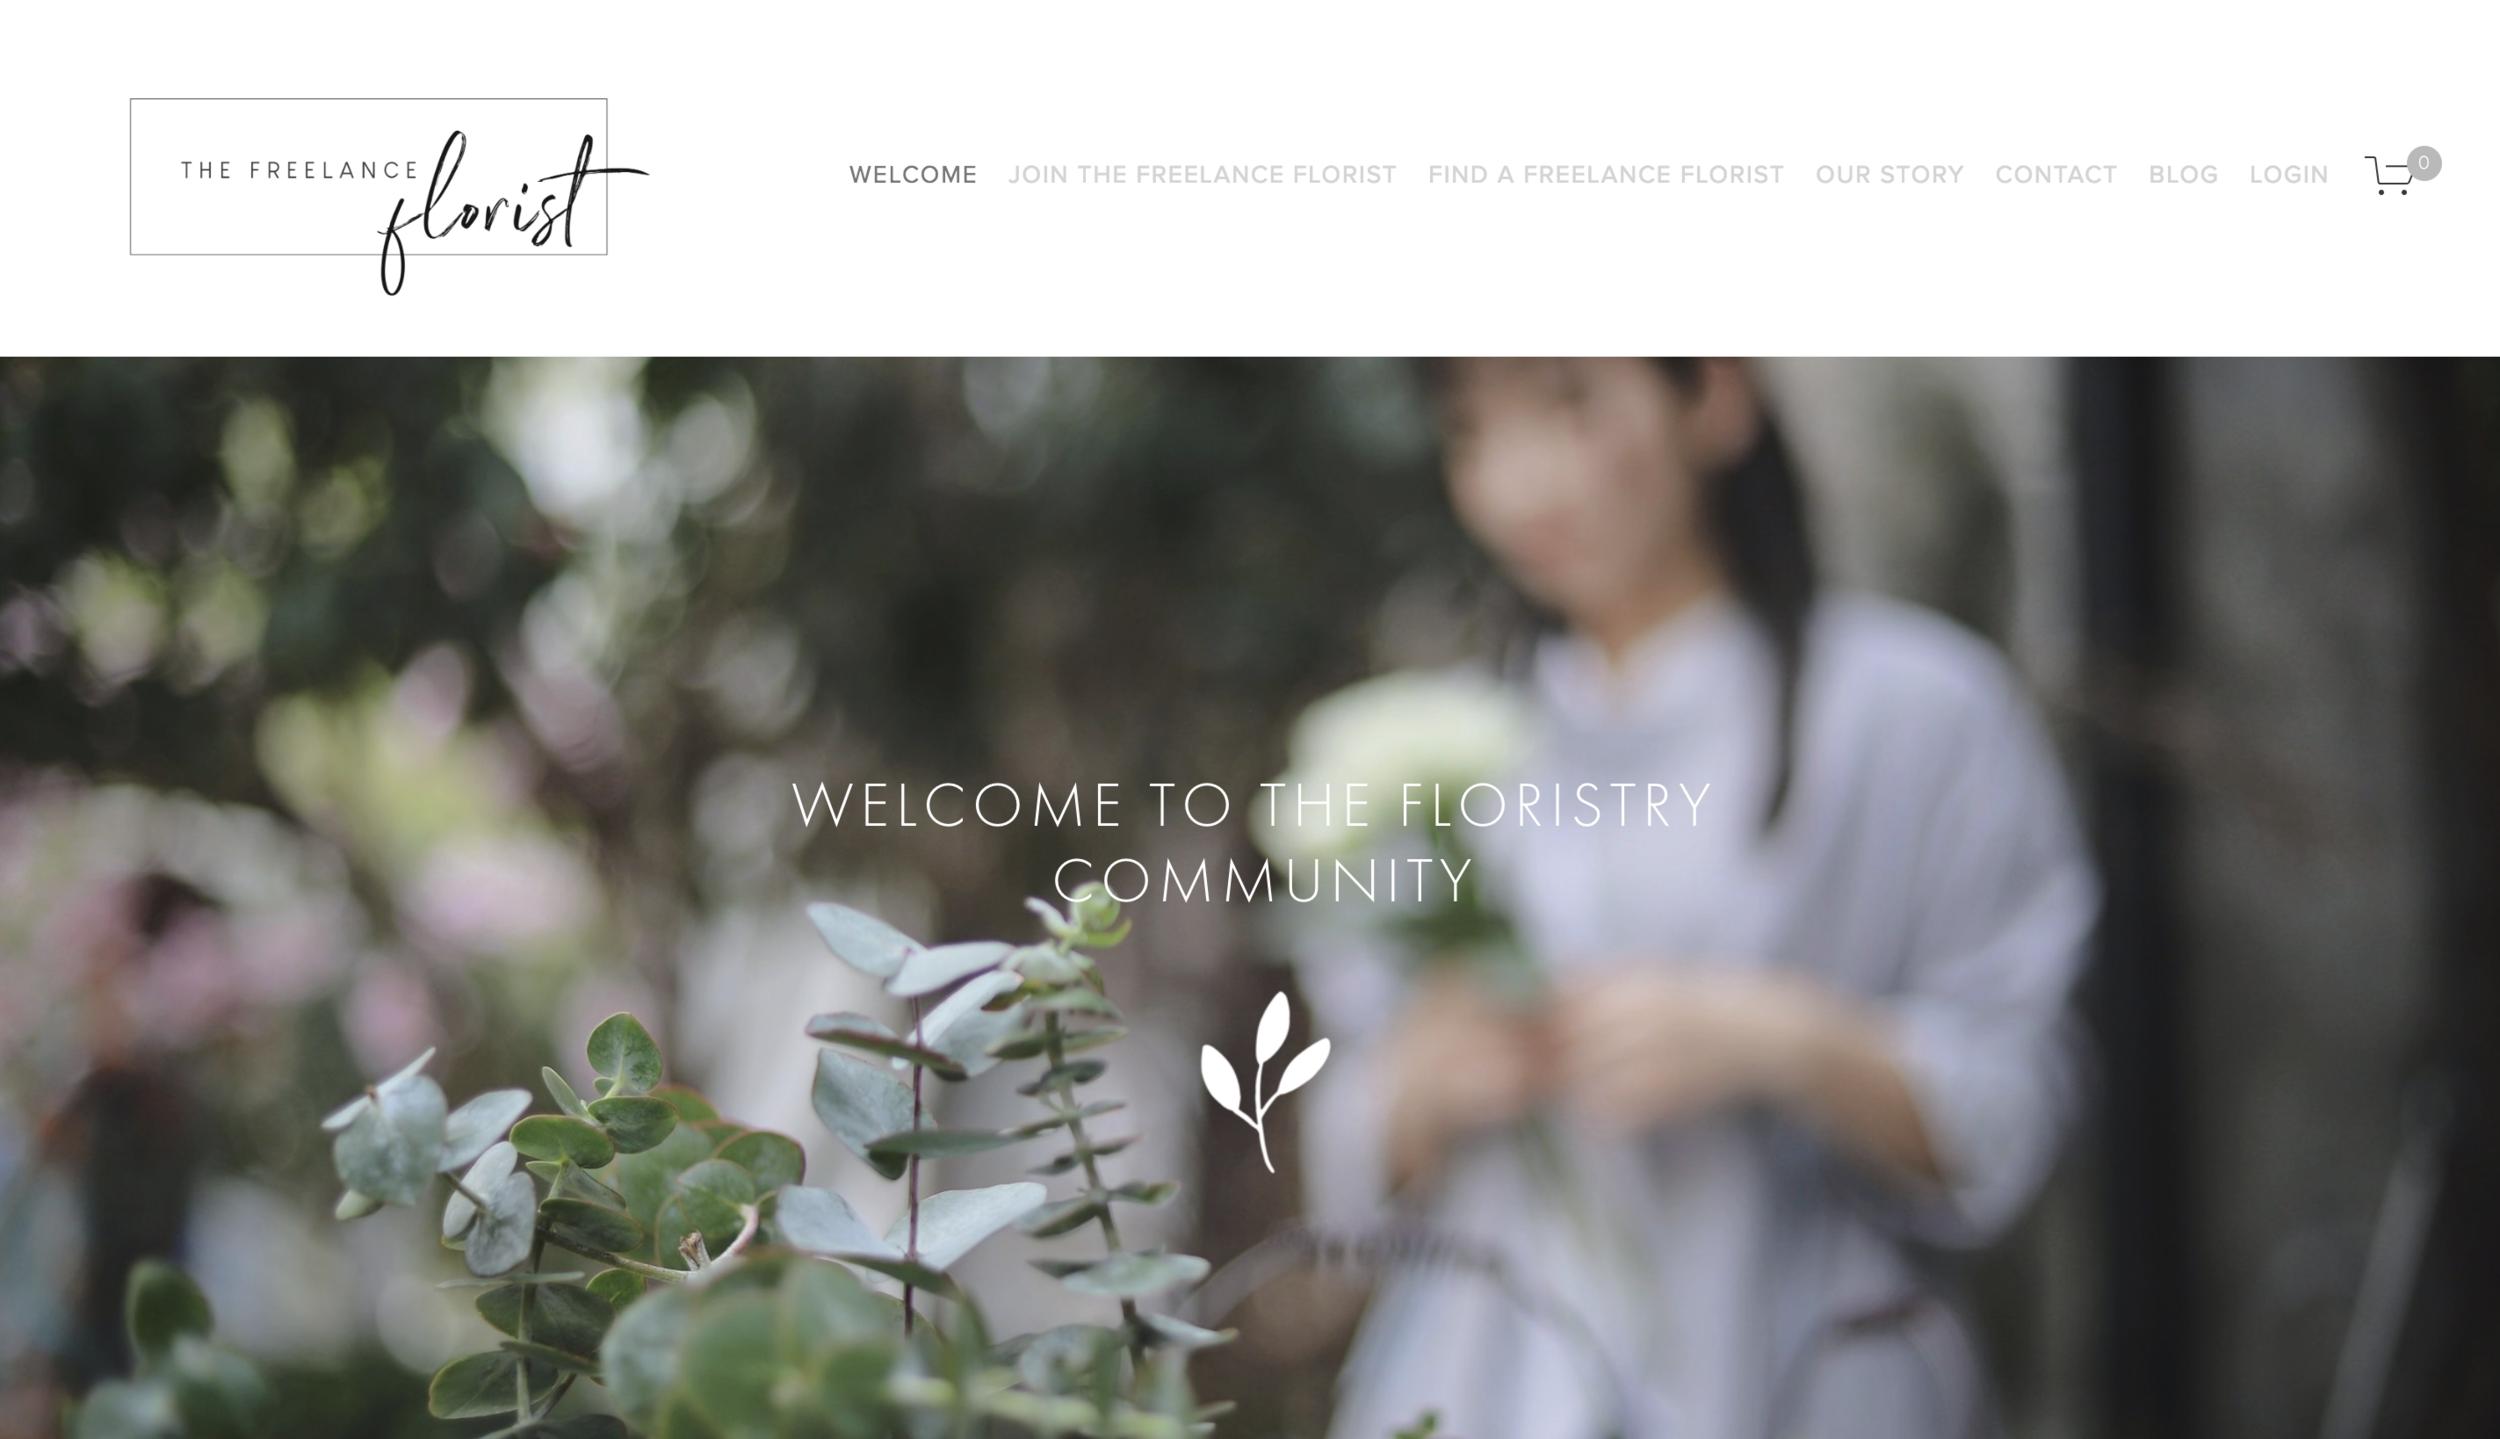 the freelance florist website